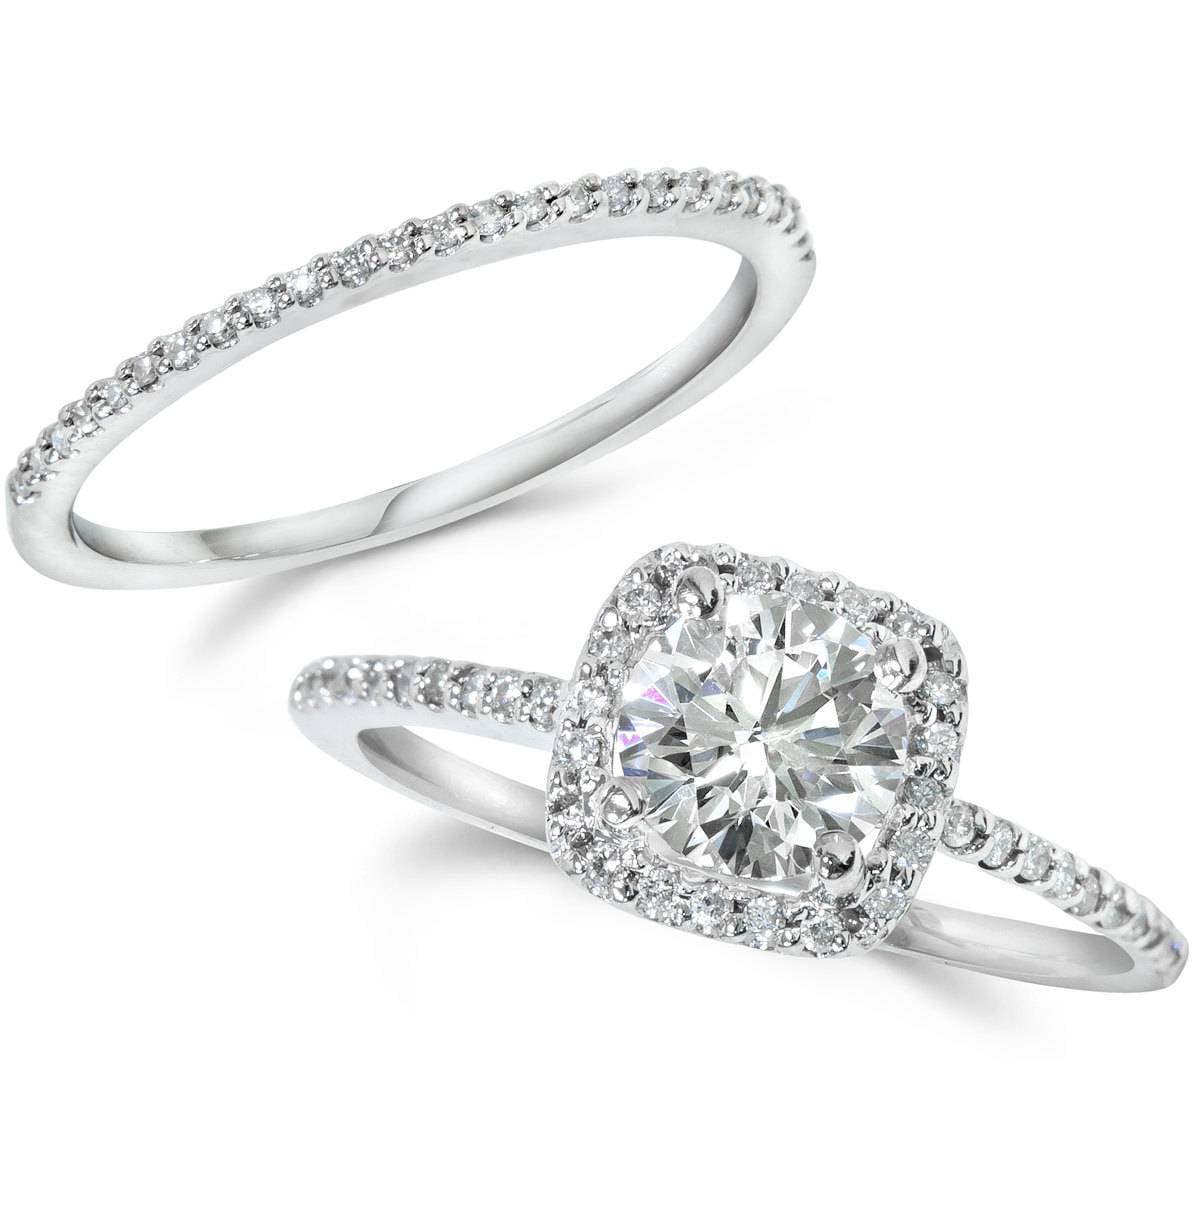 Cushion Halo Diamond 1 ct Engagement Ring Matching Wedding Ring 14K White Gold by Pompeii3